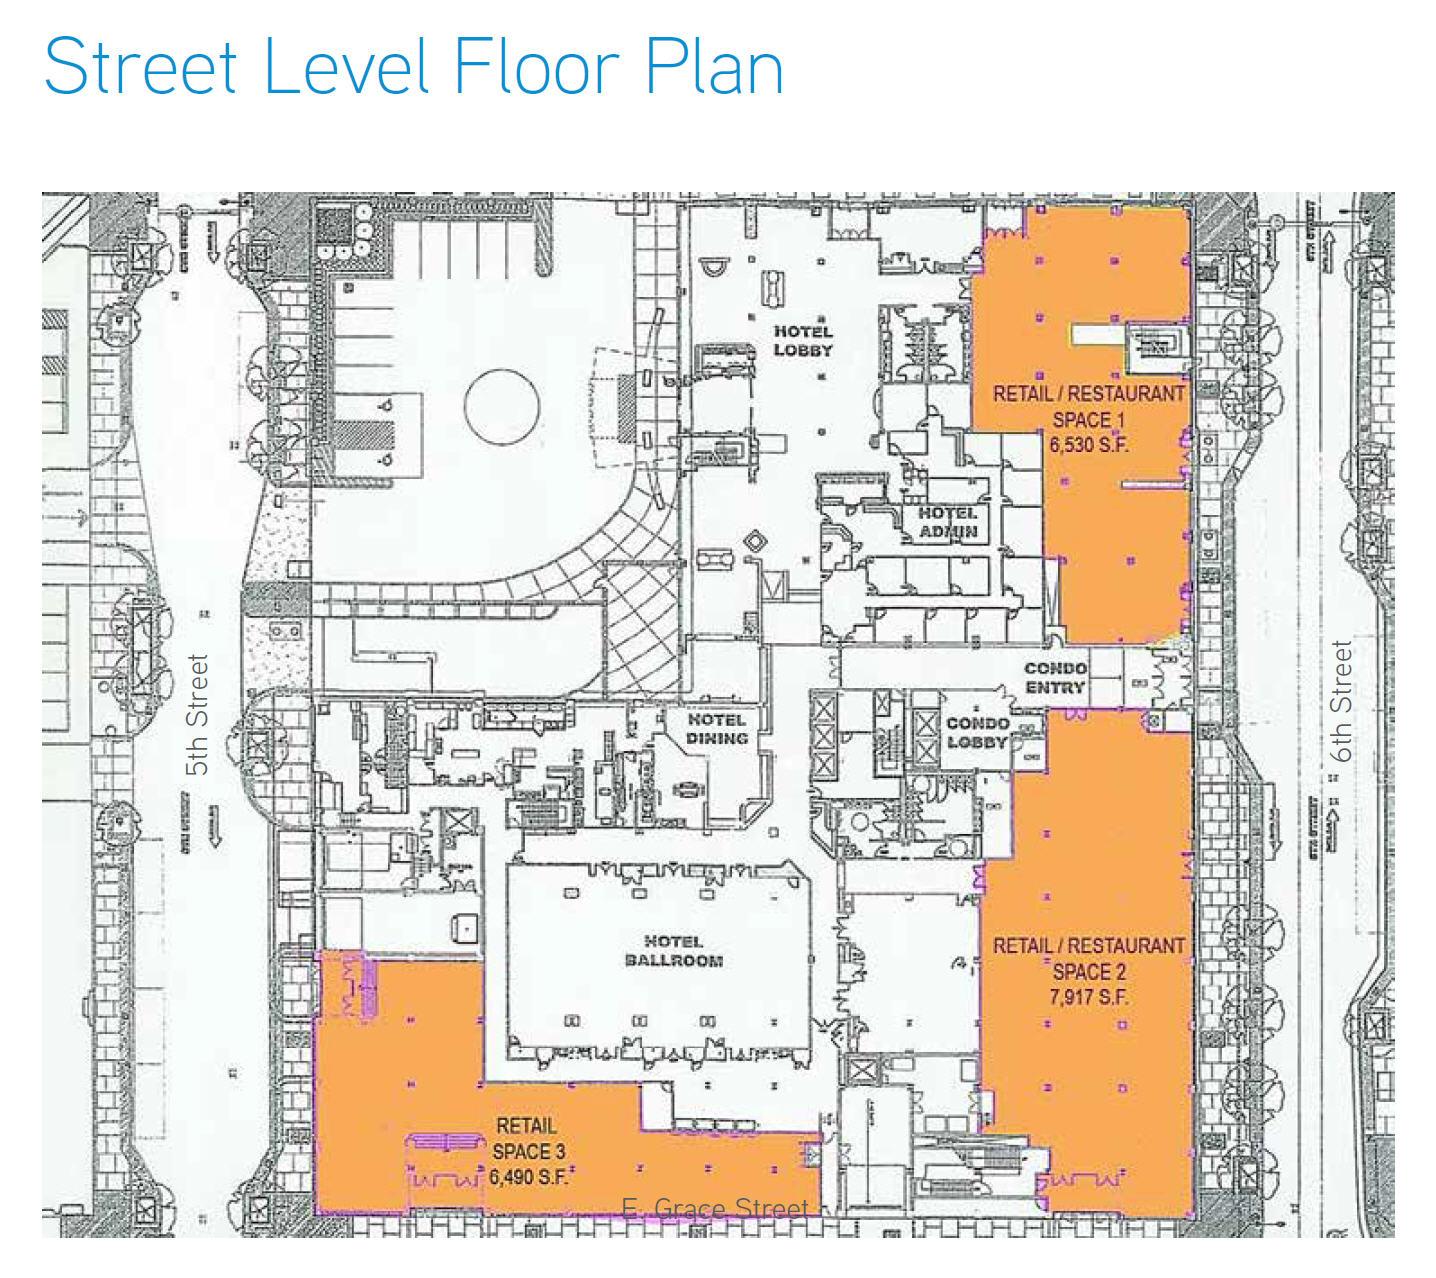 floorplan options download floorplan options pdf